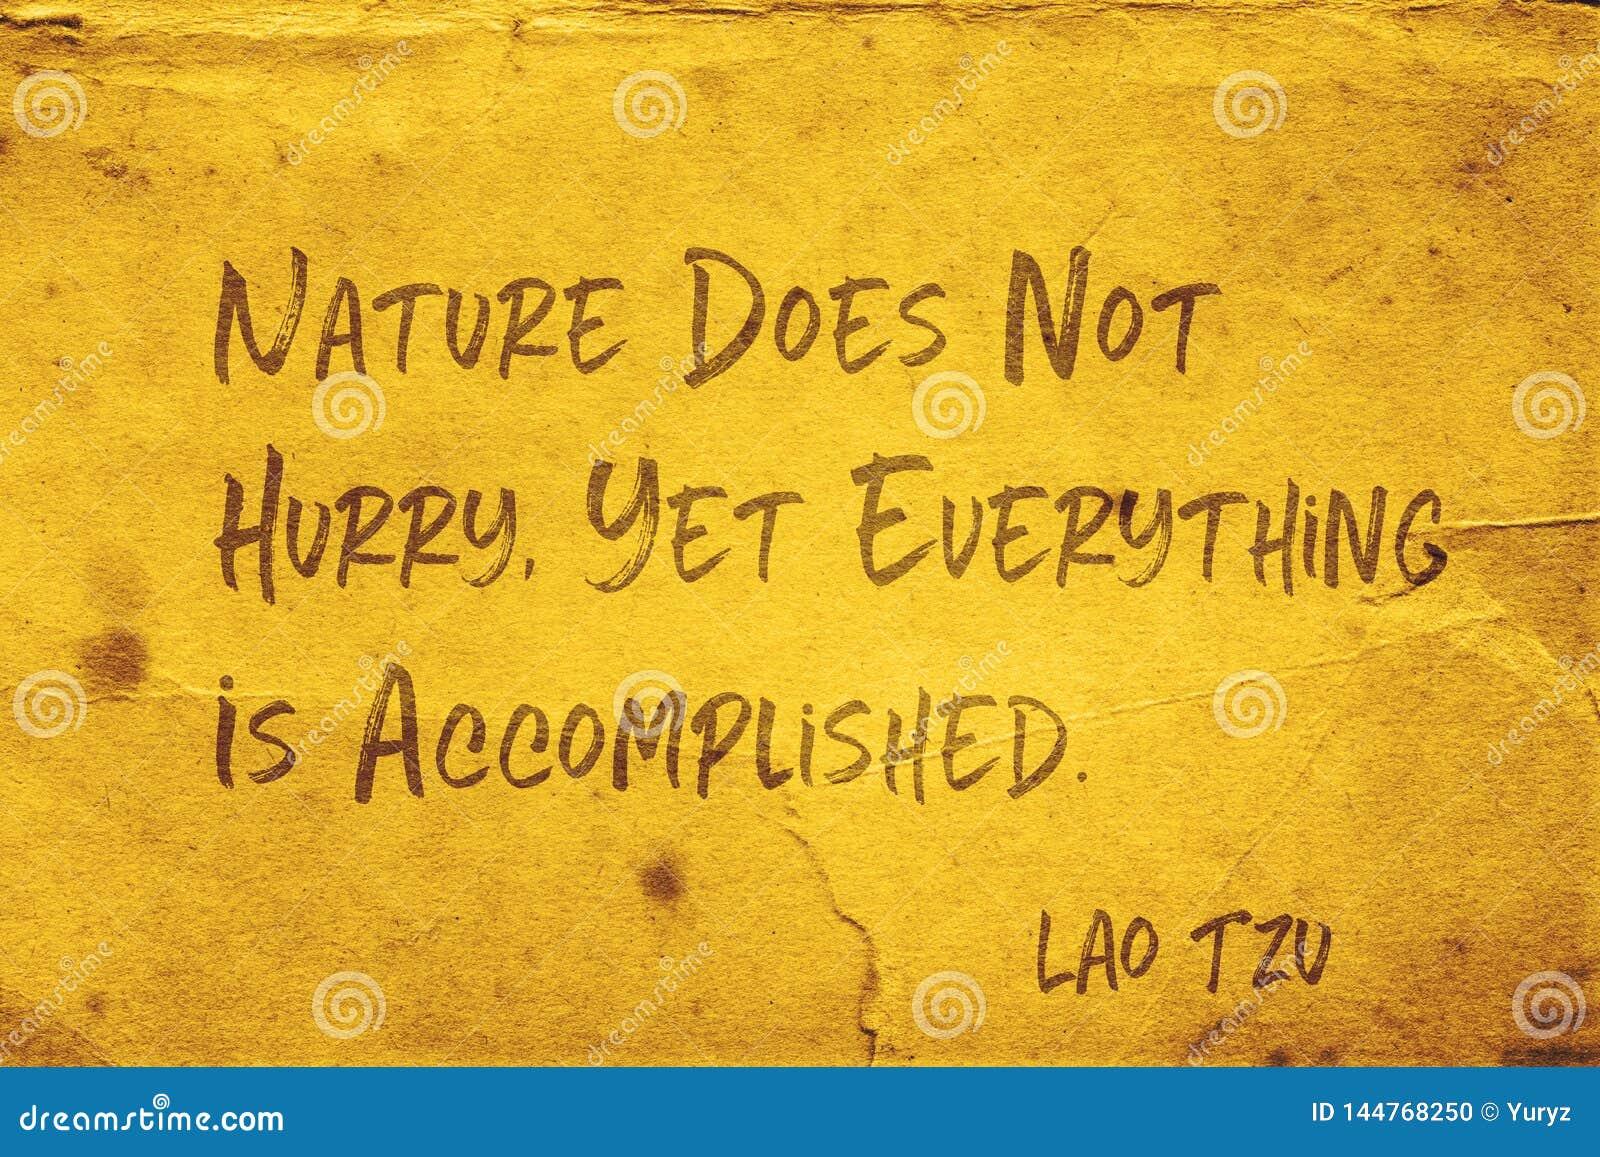 Nature not hurry Lao Tzu